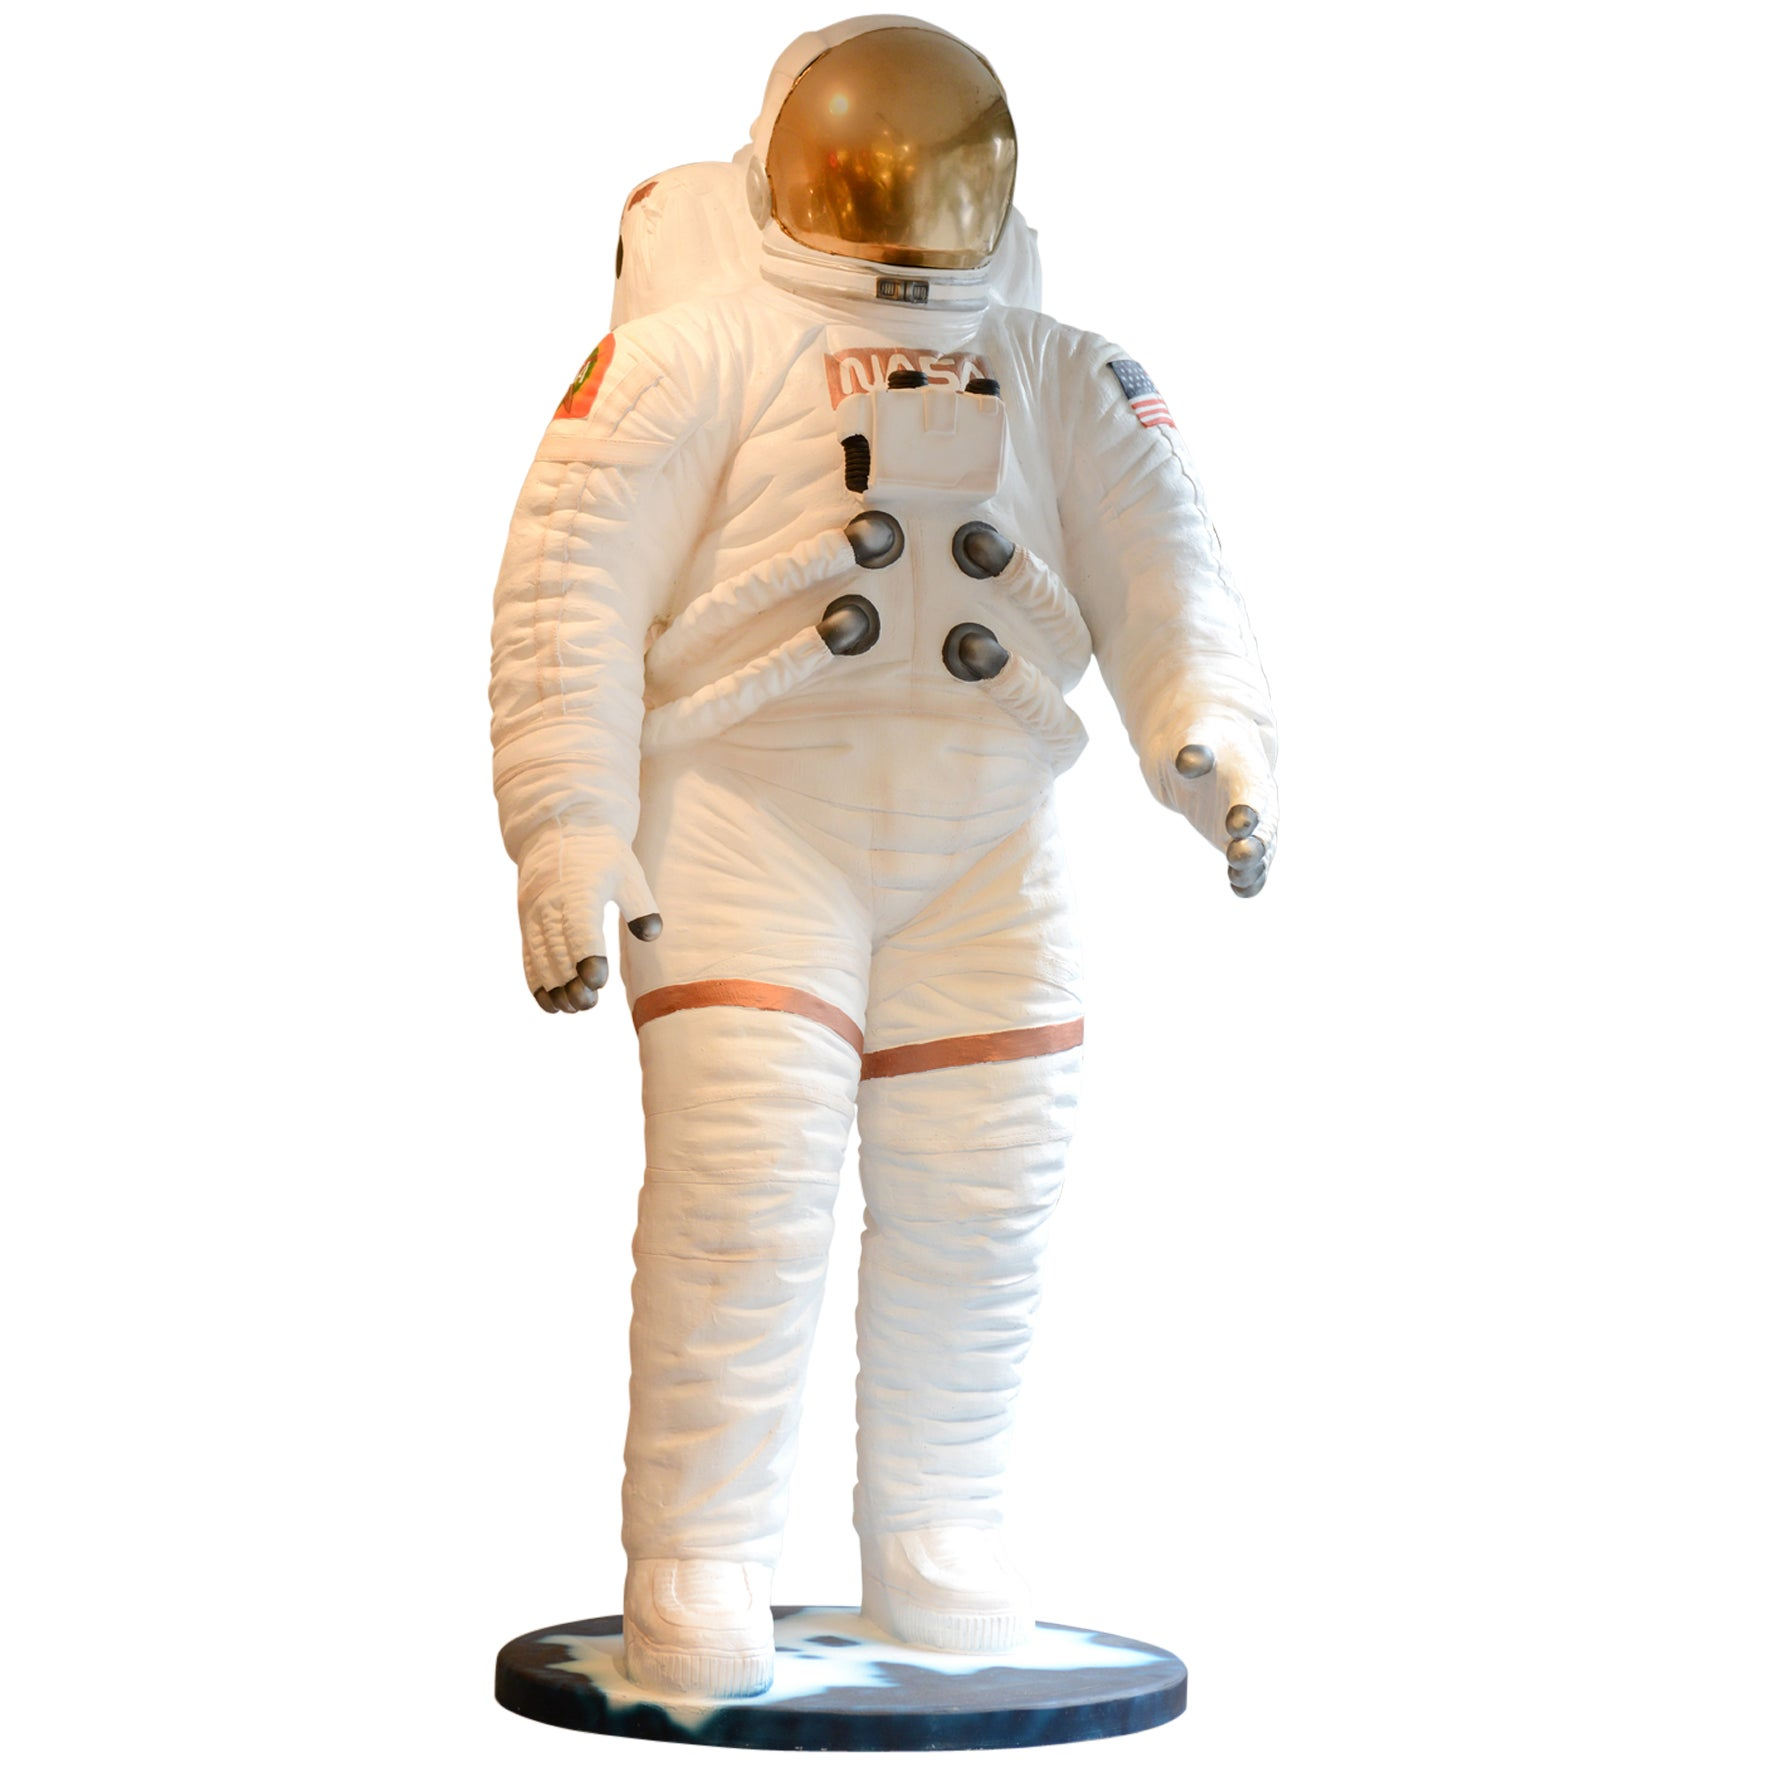 US Astronaut NASA Sculpture in Resin 2016